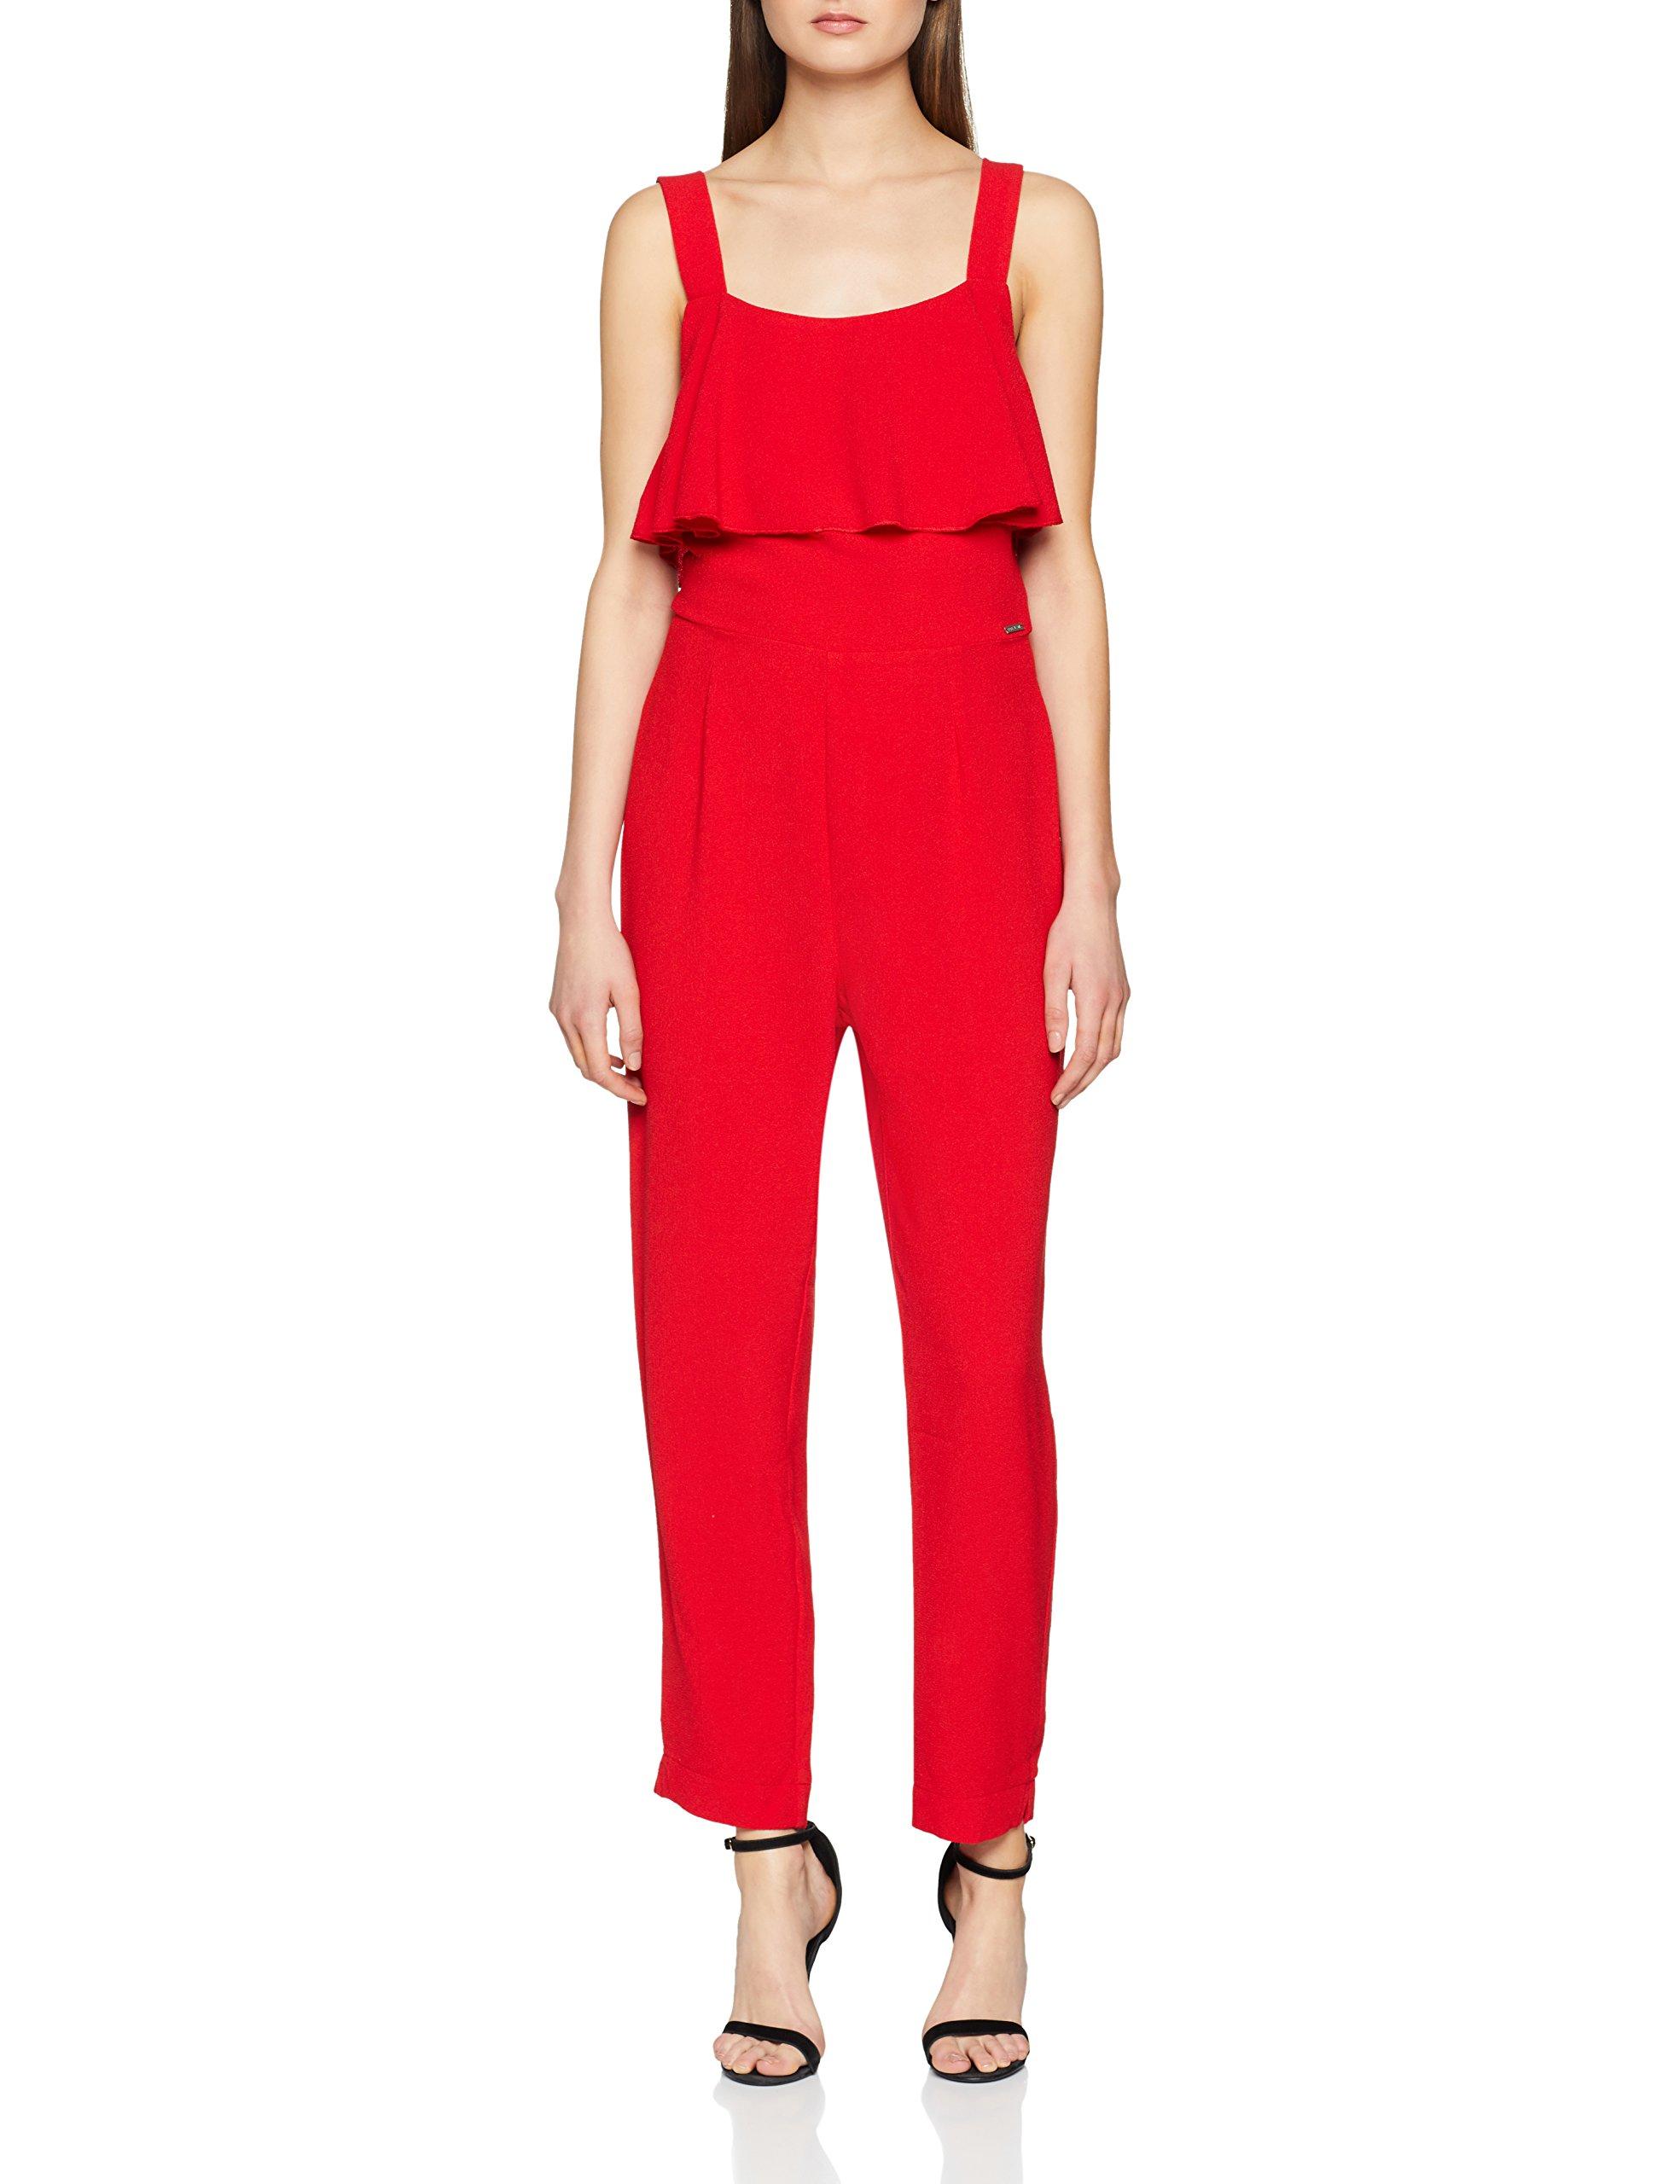 RedMedium Pepe Femme CombinaisonMars Pl230210 Caroli Jeans hQsdtr